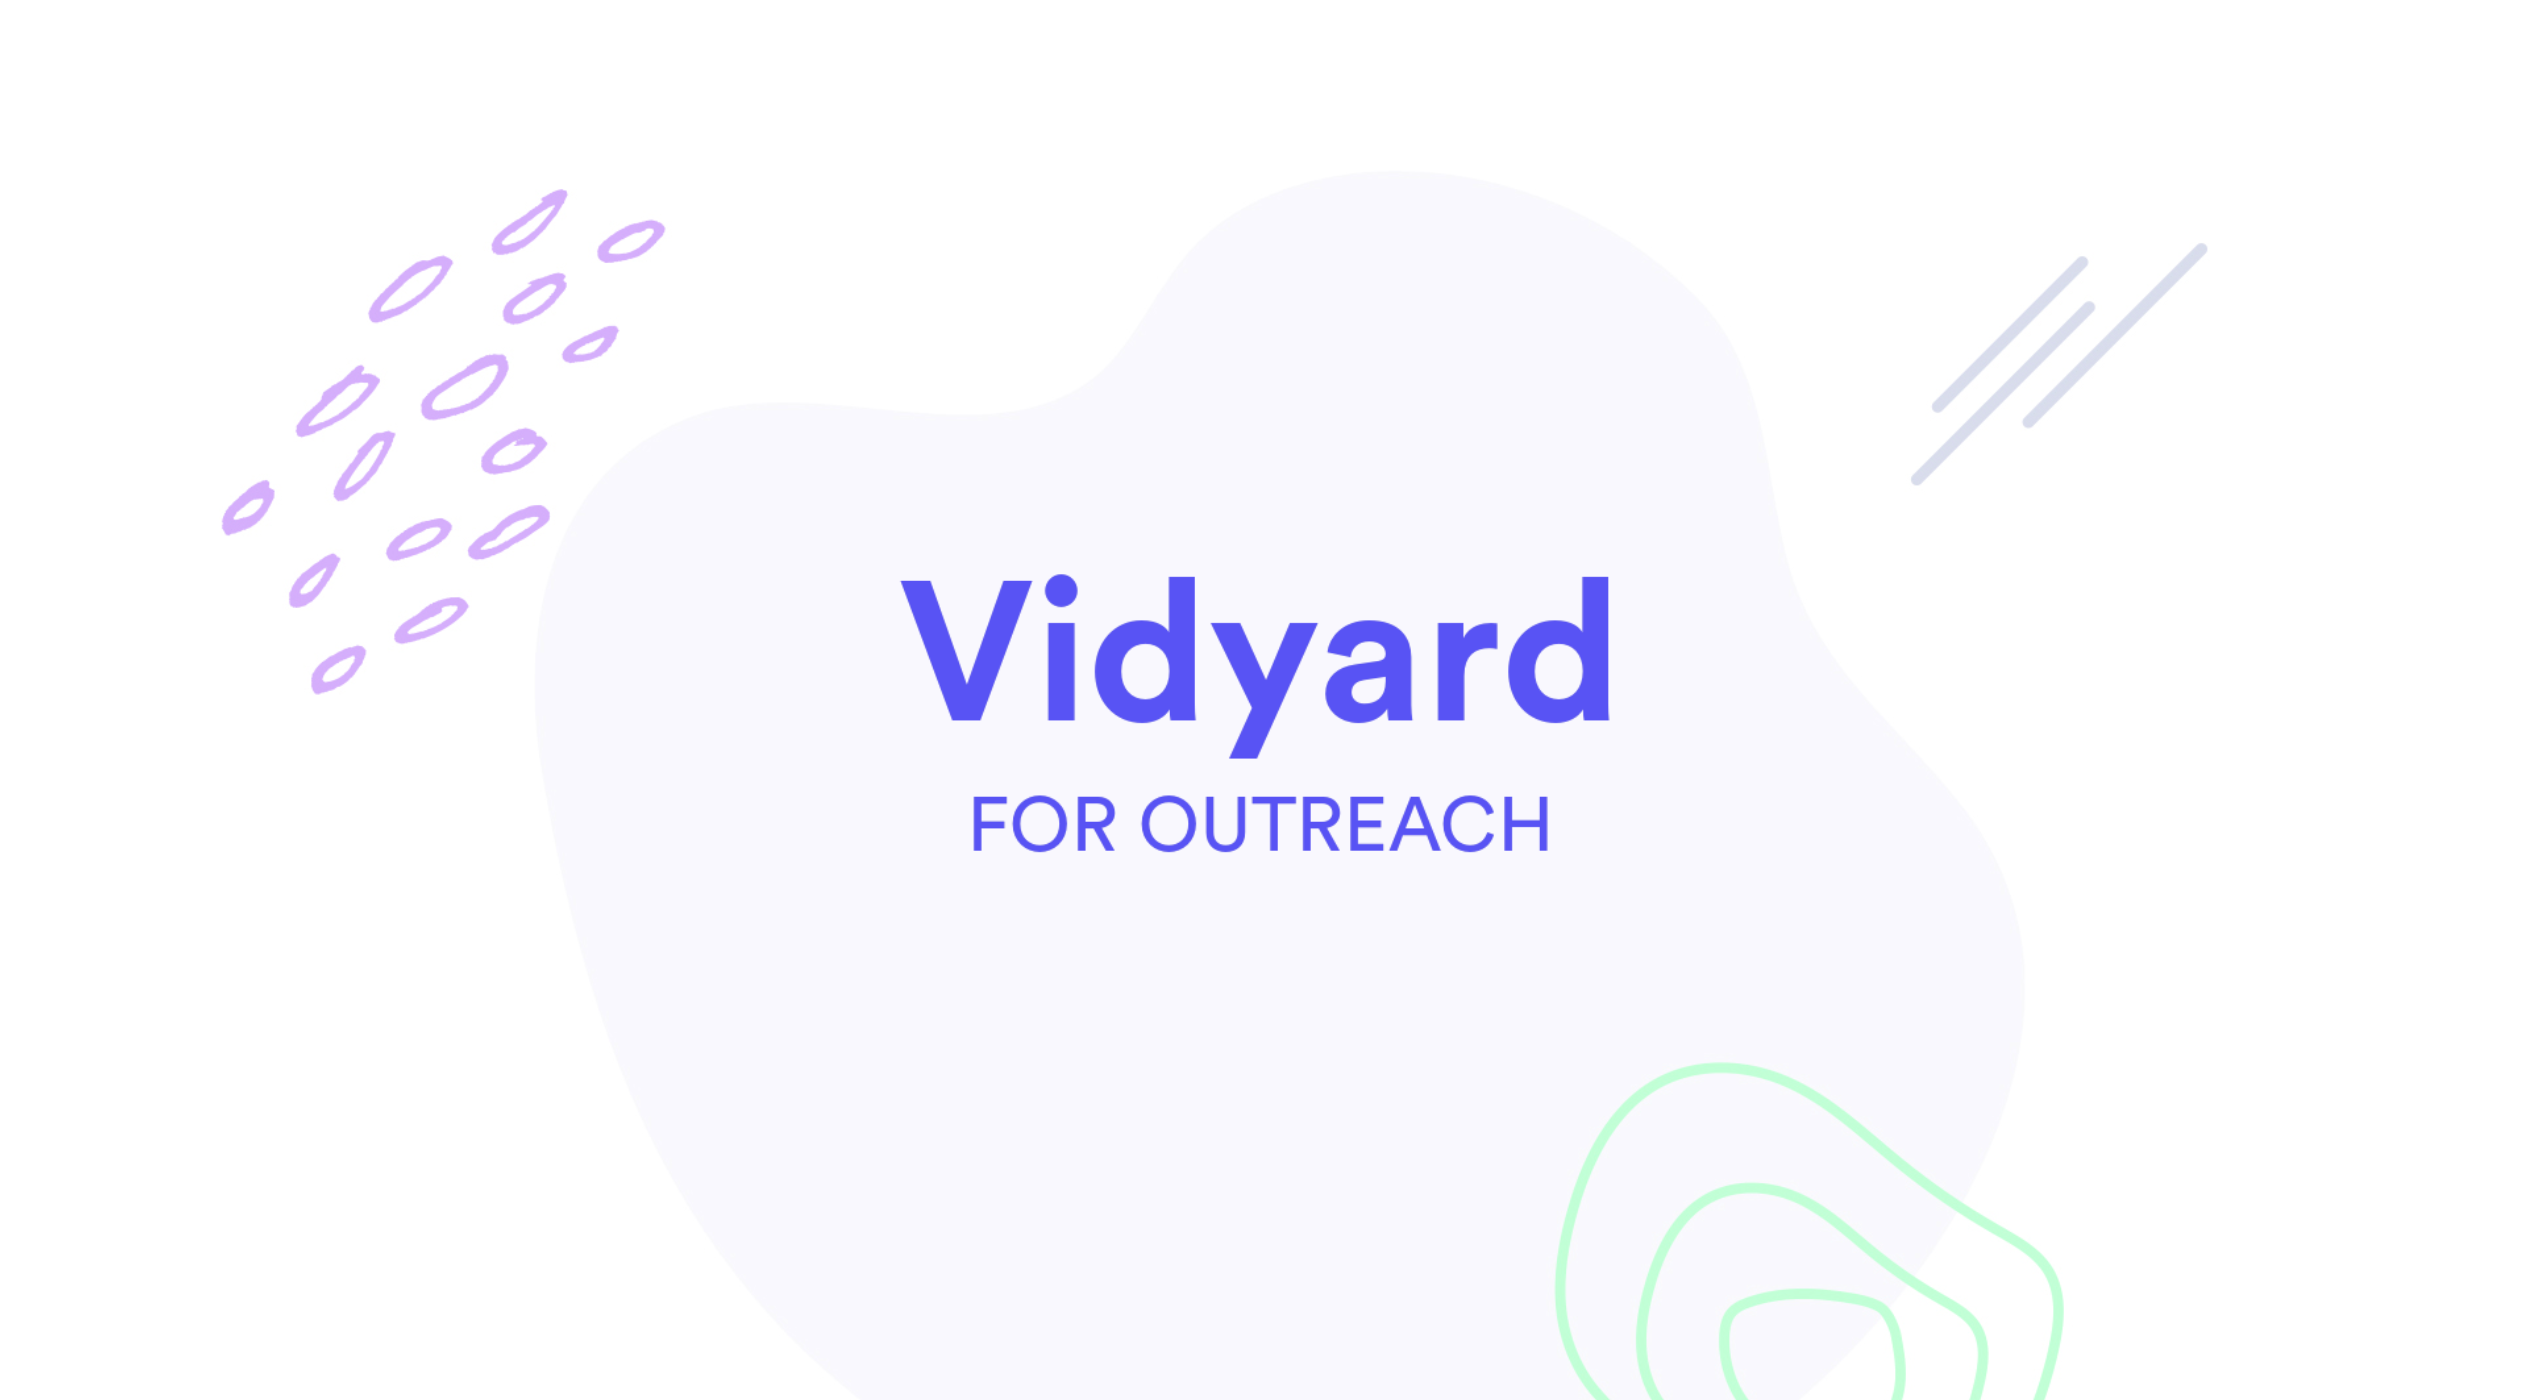 Vidyard GoVideo + Outreach Integration Video